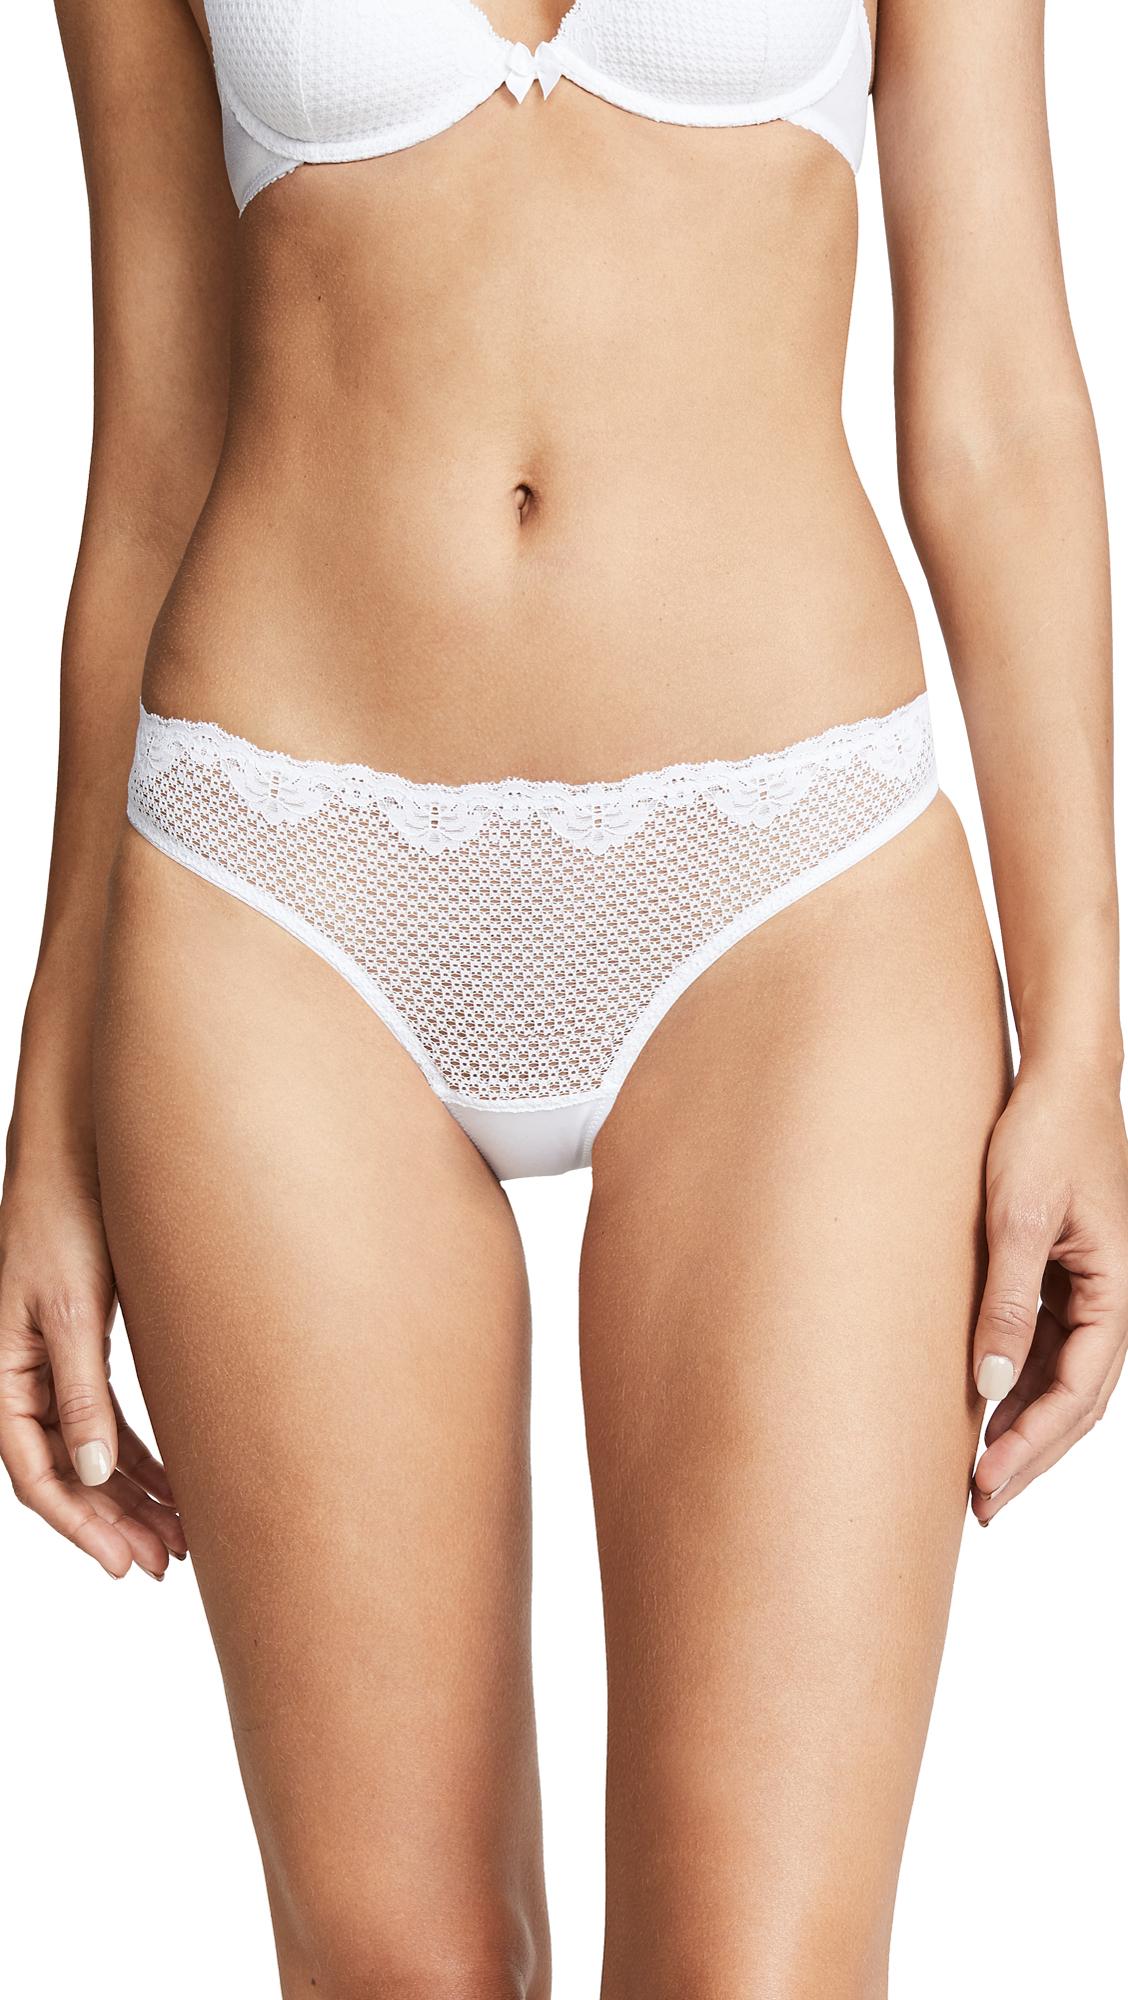 Timpa Duet Lace Low Cut Thong - White